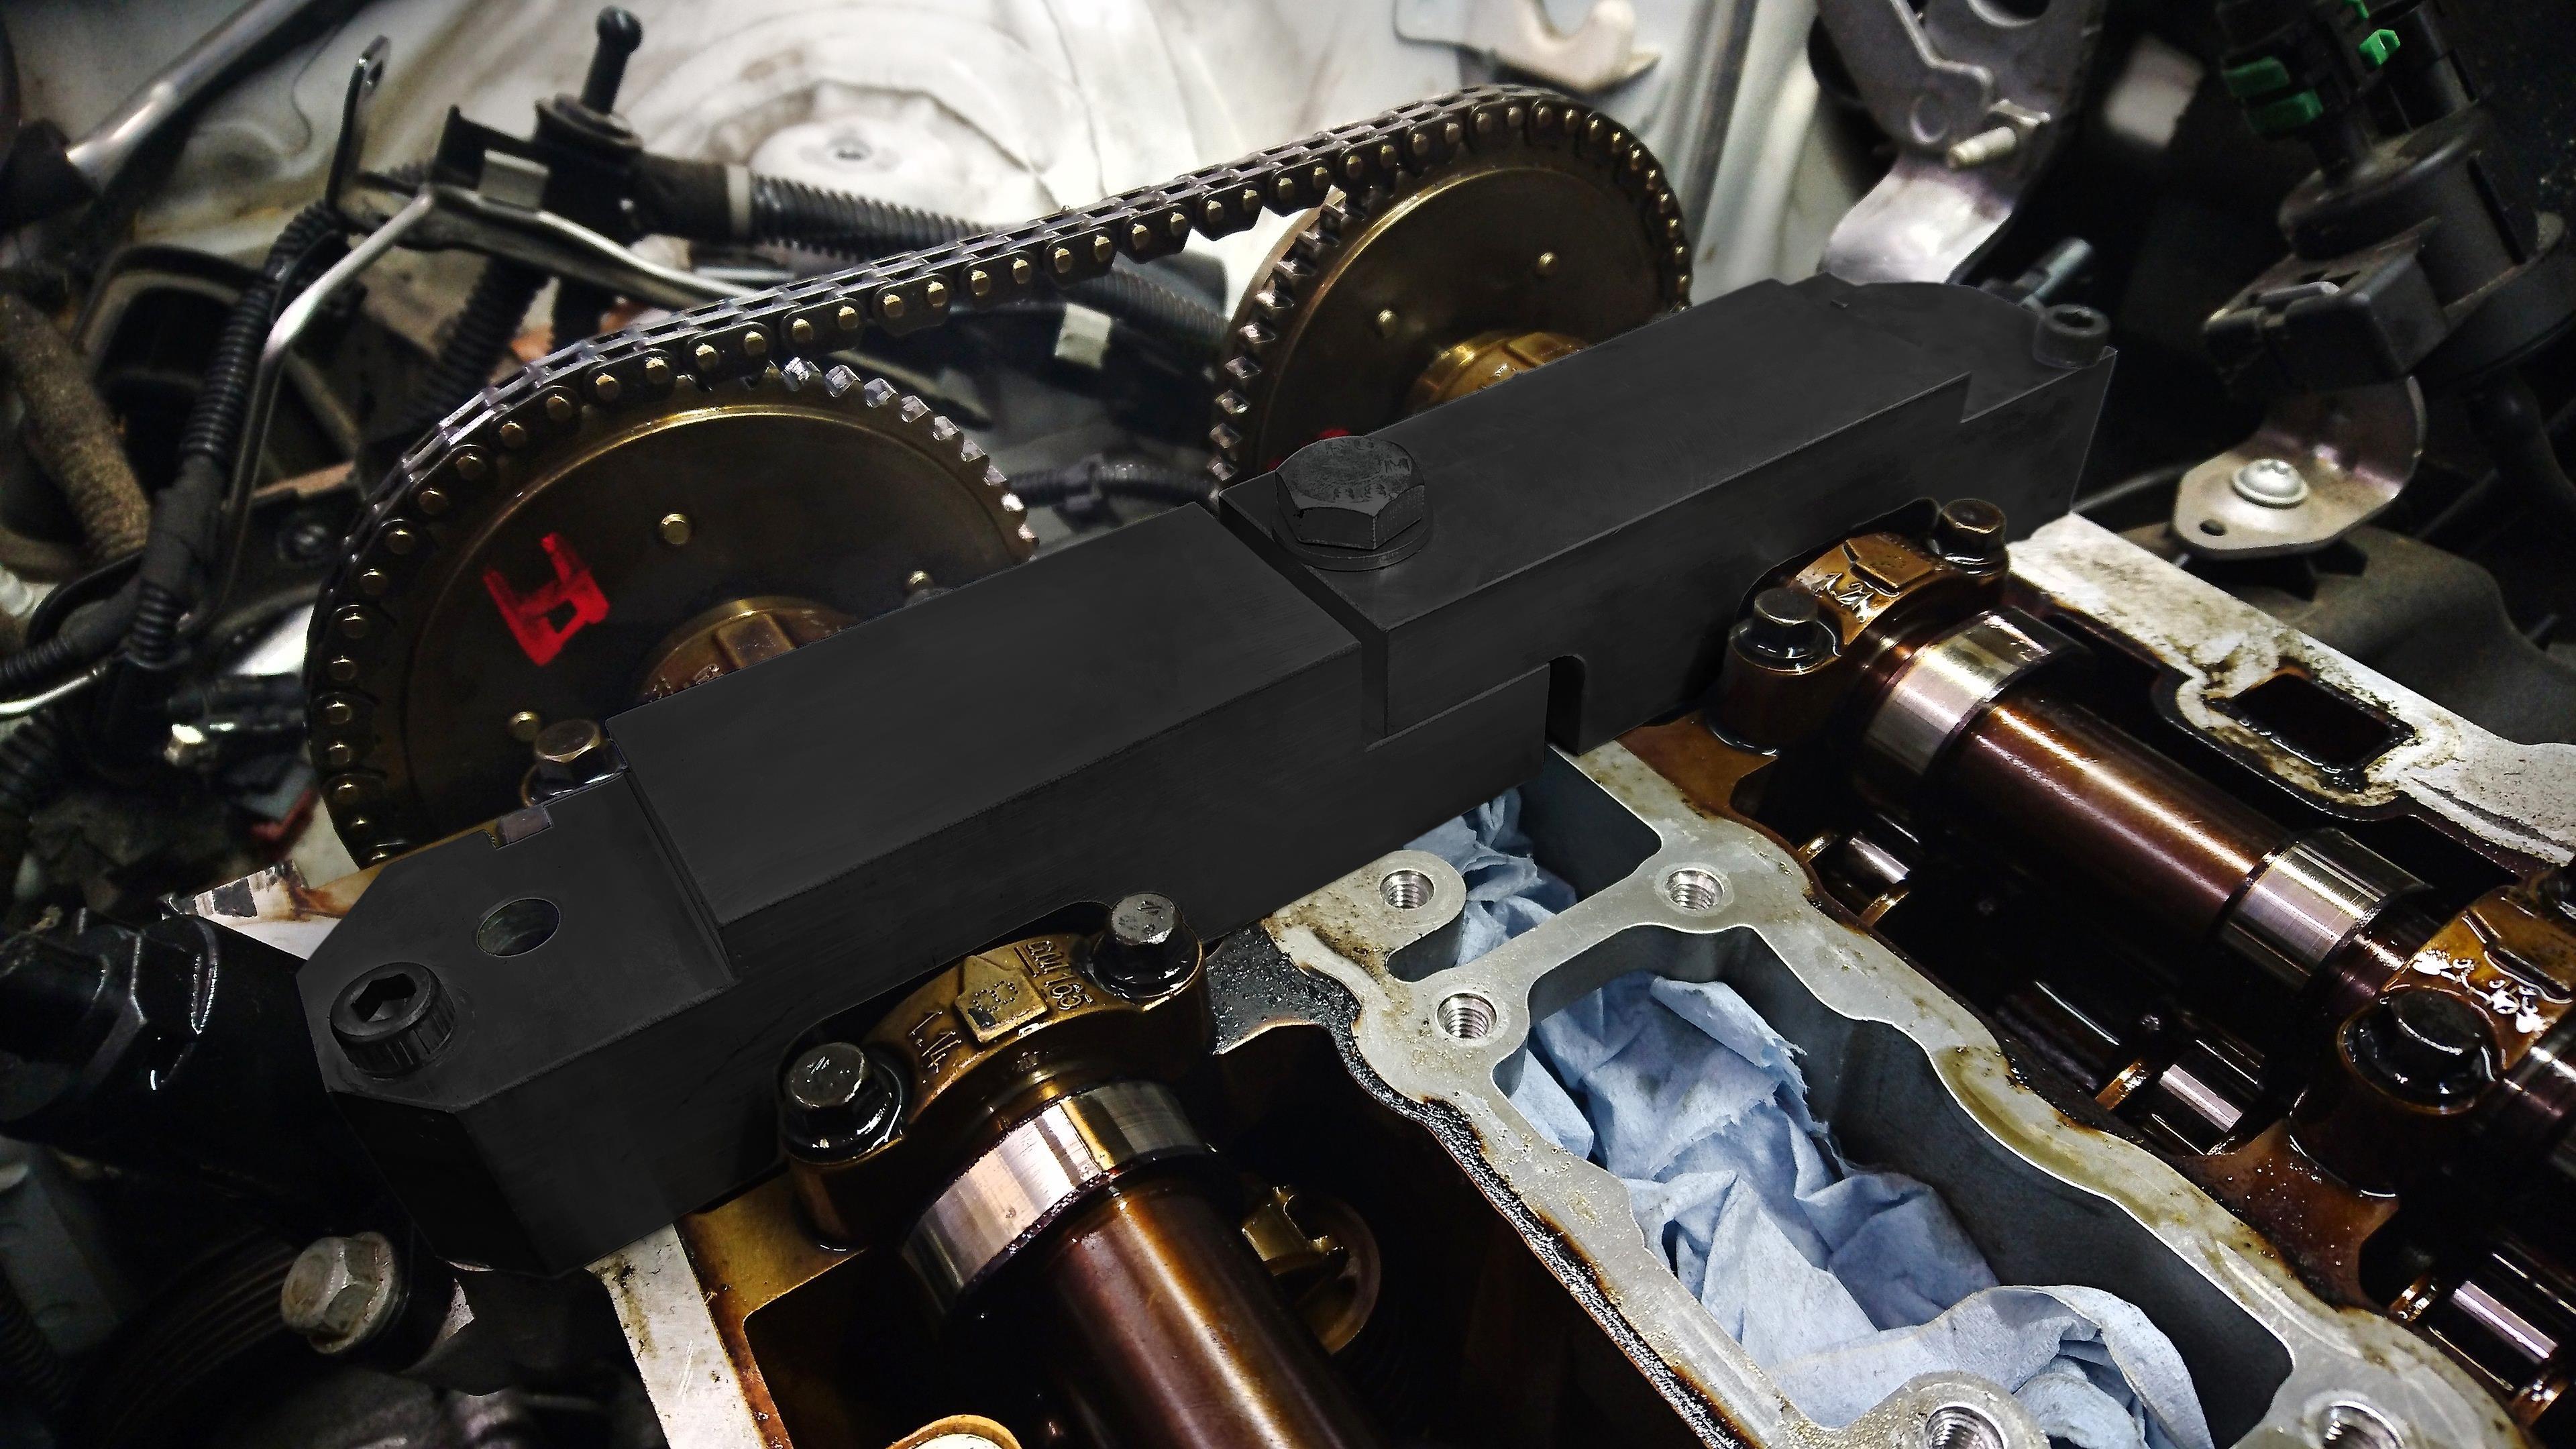 Steuerketten Wechsel Werkzeug Satz Opel 1 6 Sidi Turbo Sidi Ecoflex